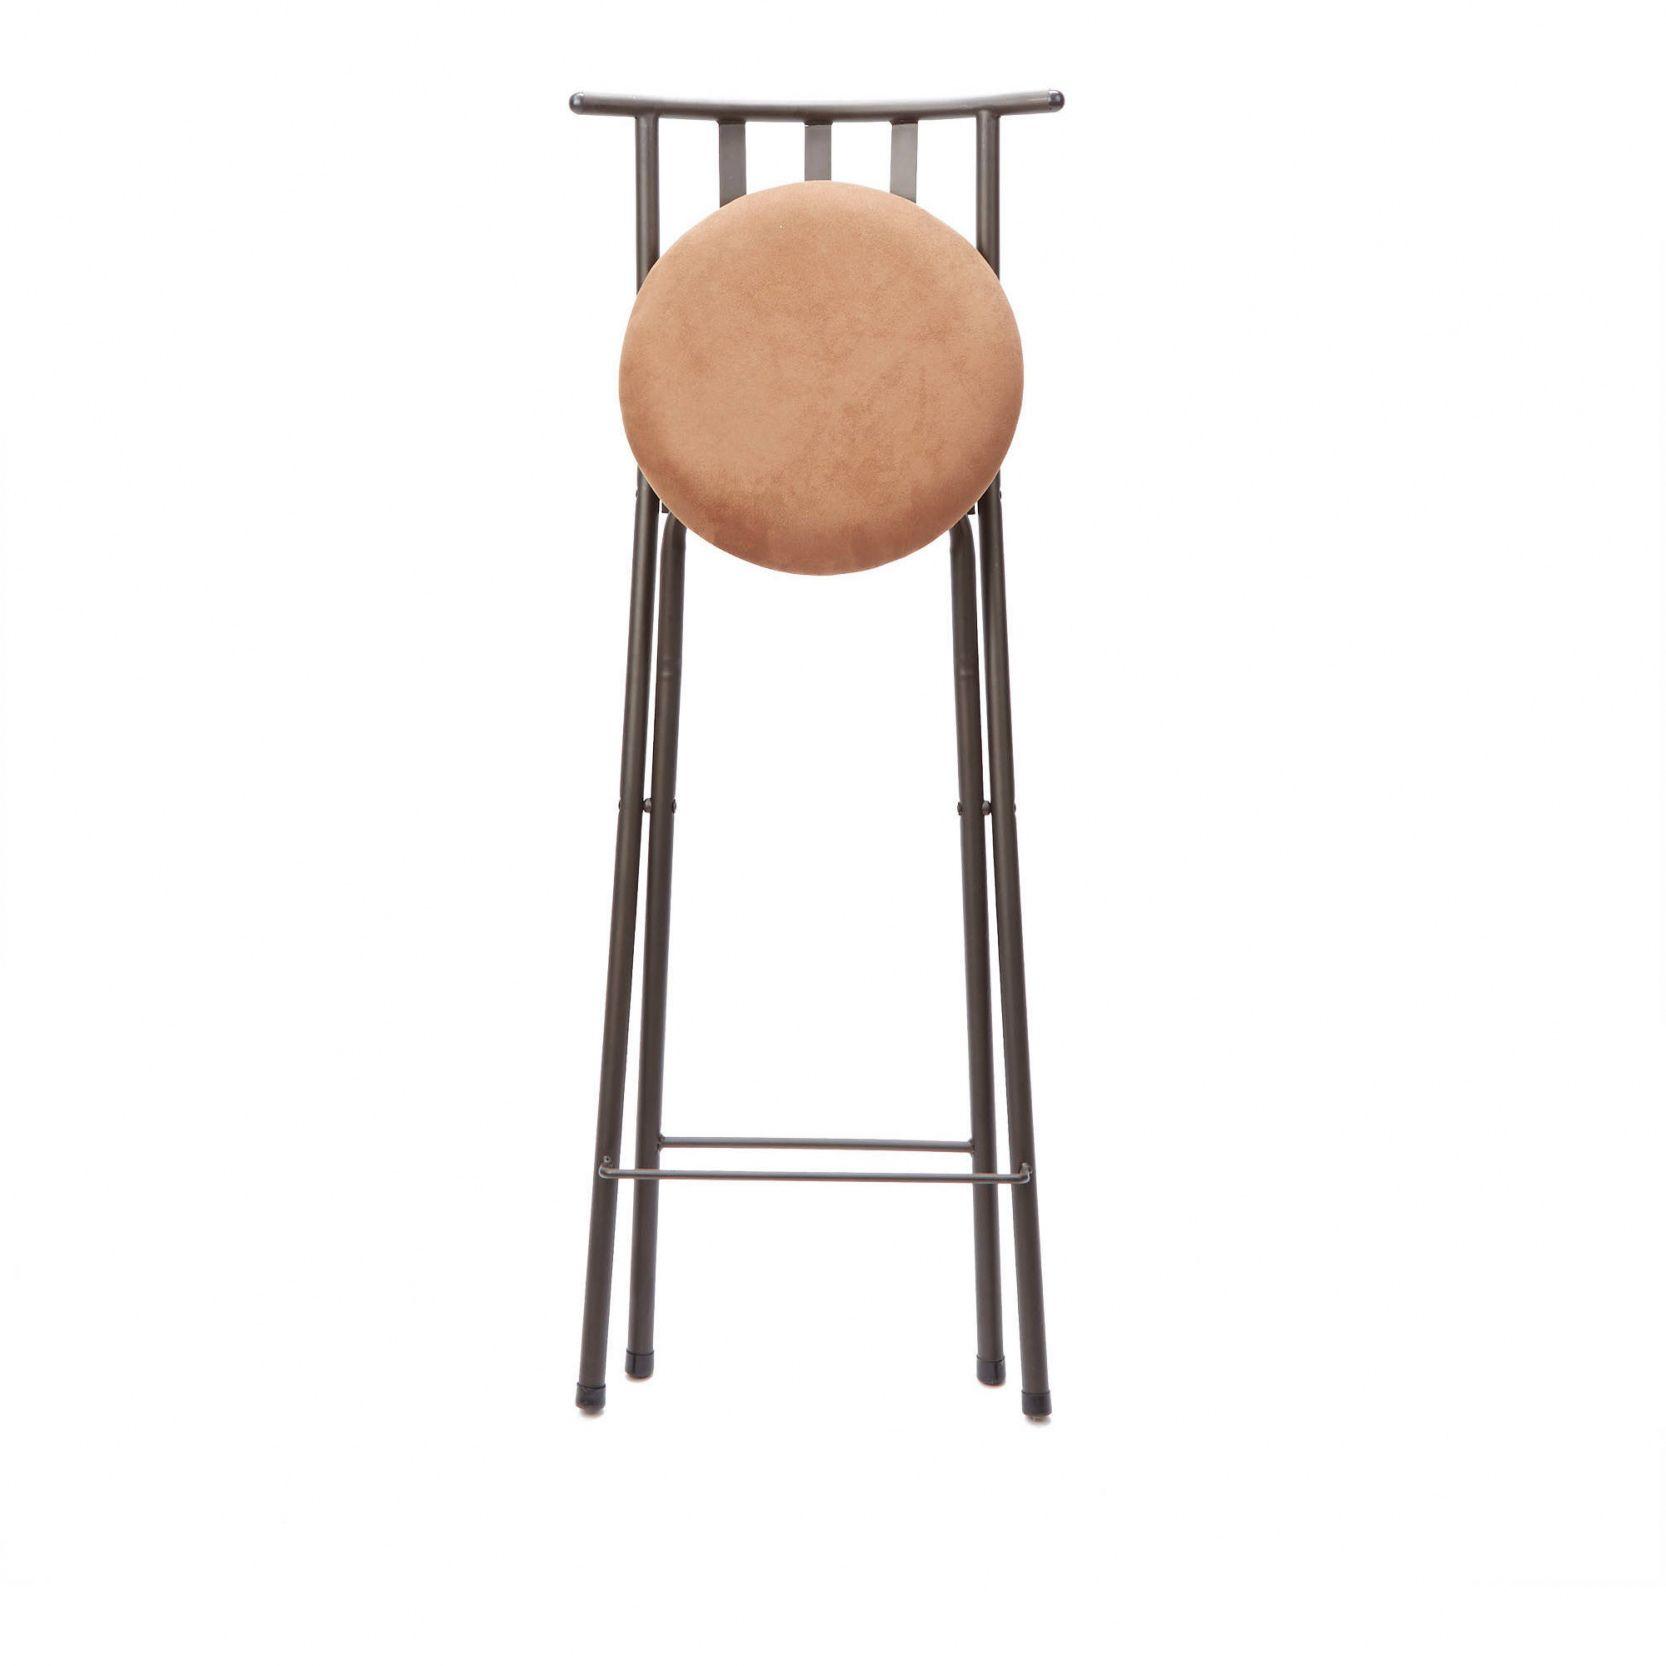 Folding bar stools vintage modern furniture check more at http evildaysoflucklessjohn com 70 30 inch folding bar stools modern classic furniture